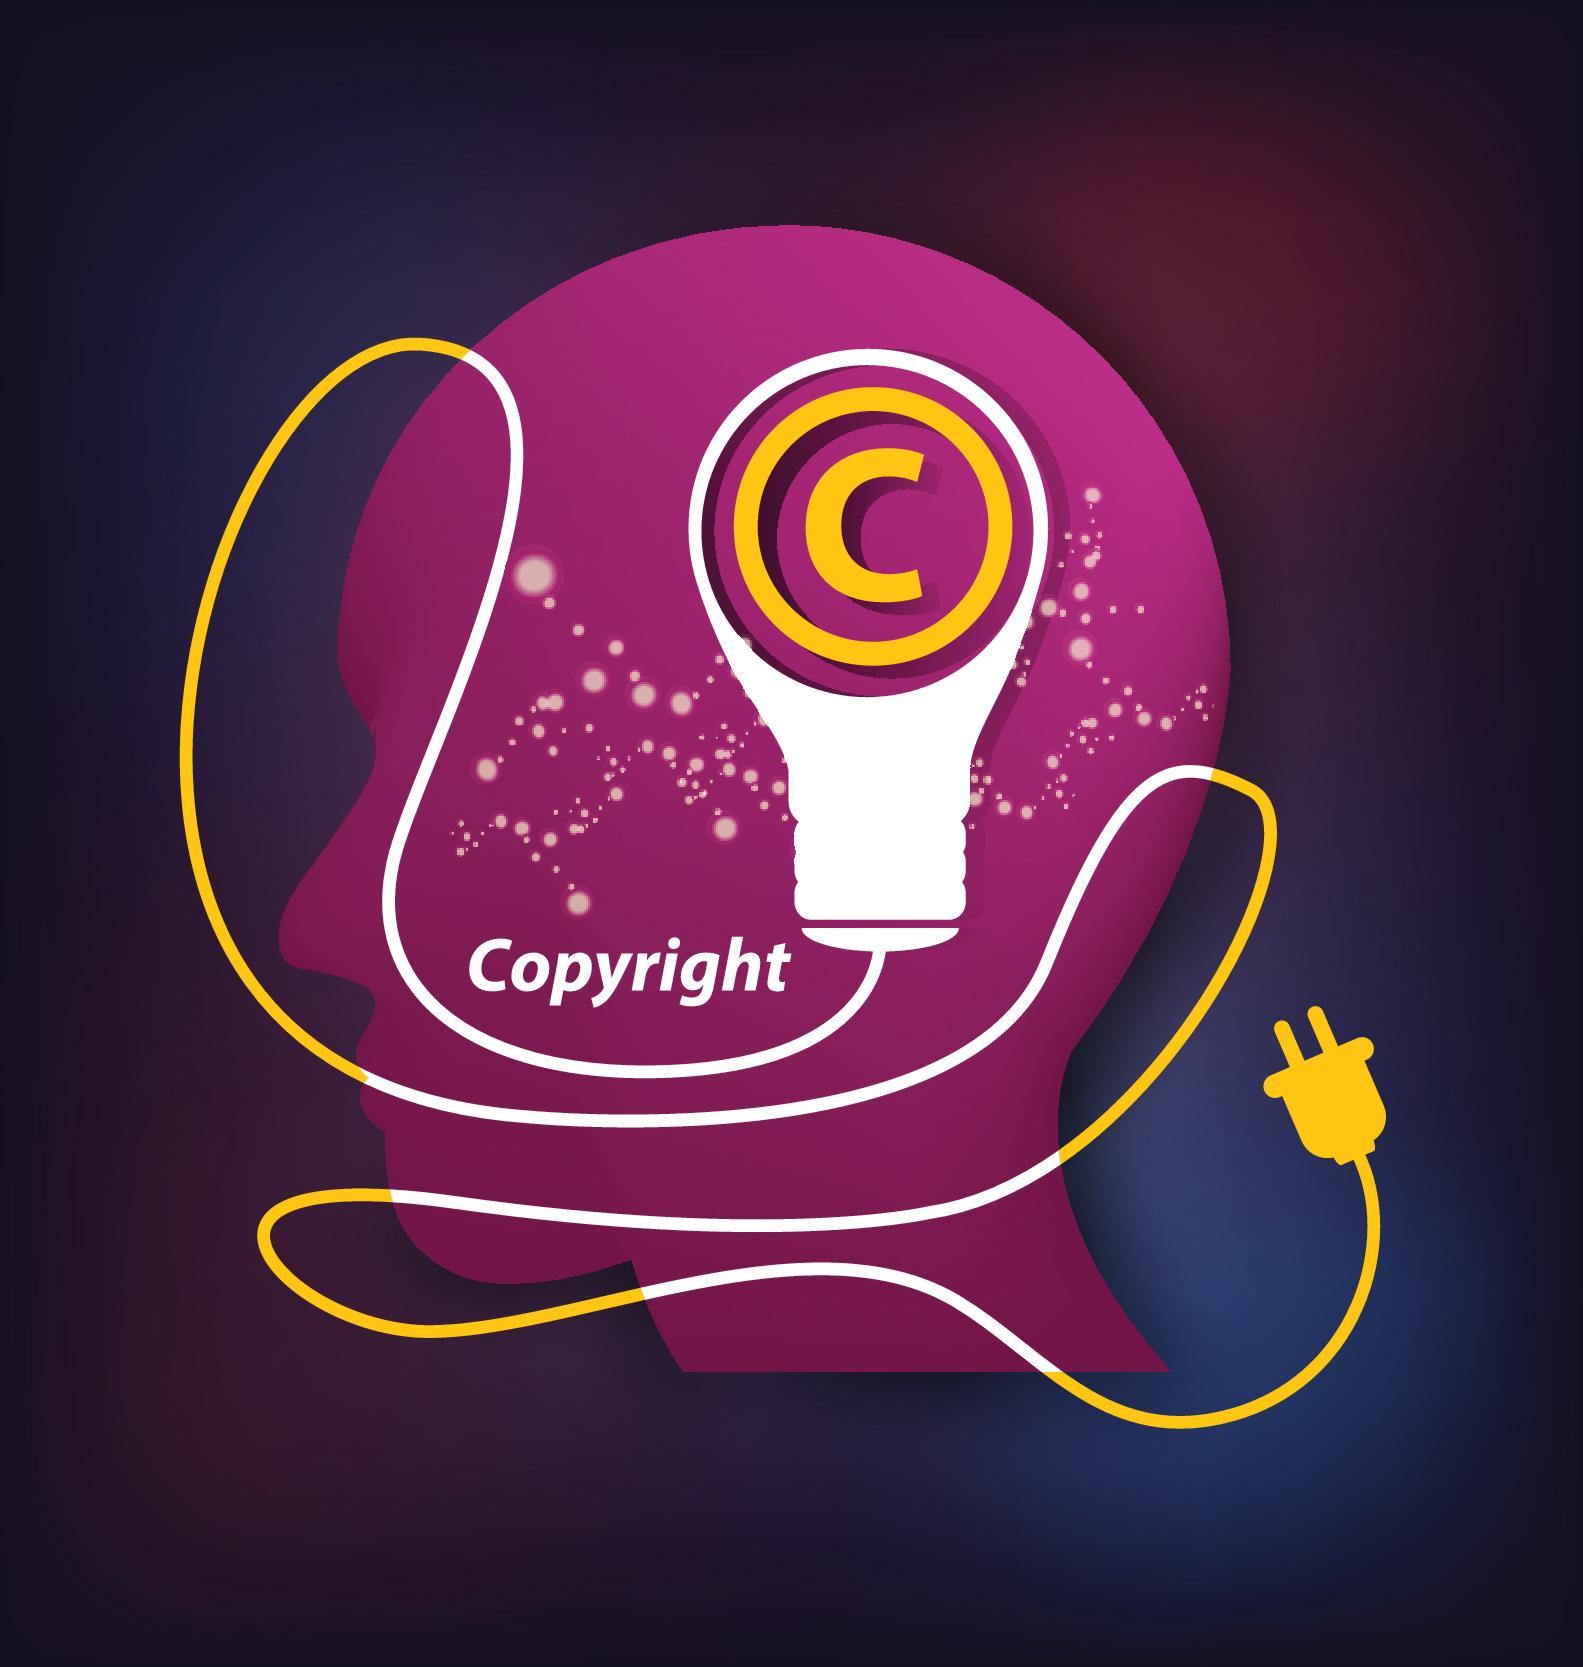 540dq33xqia5j15 Creative copyright business vector design 06